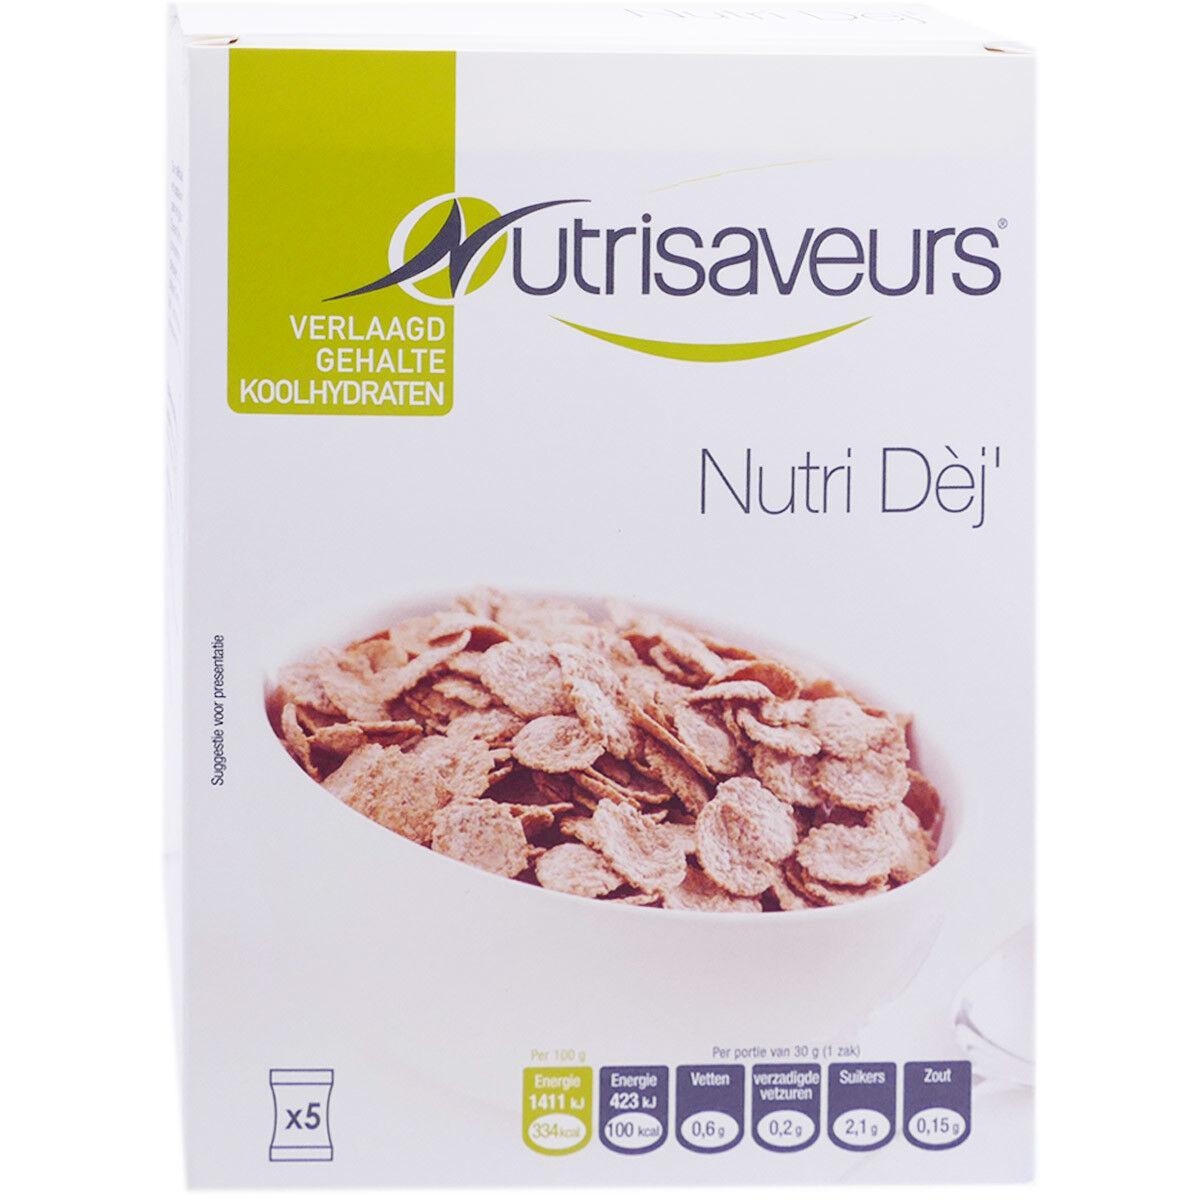 KOT Nutrisaveurs nutri dej' 5 sachets x 30g